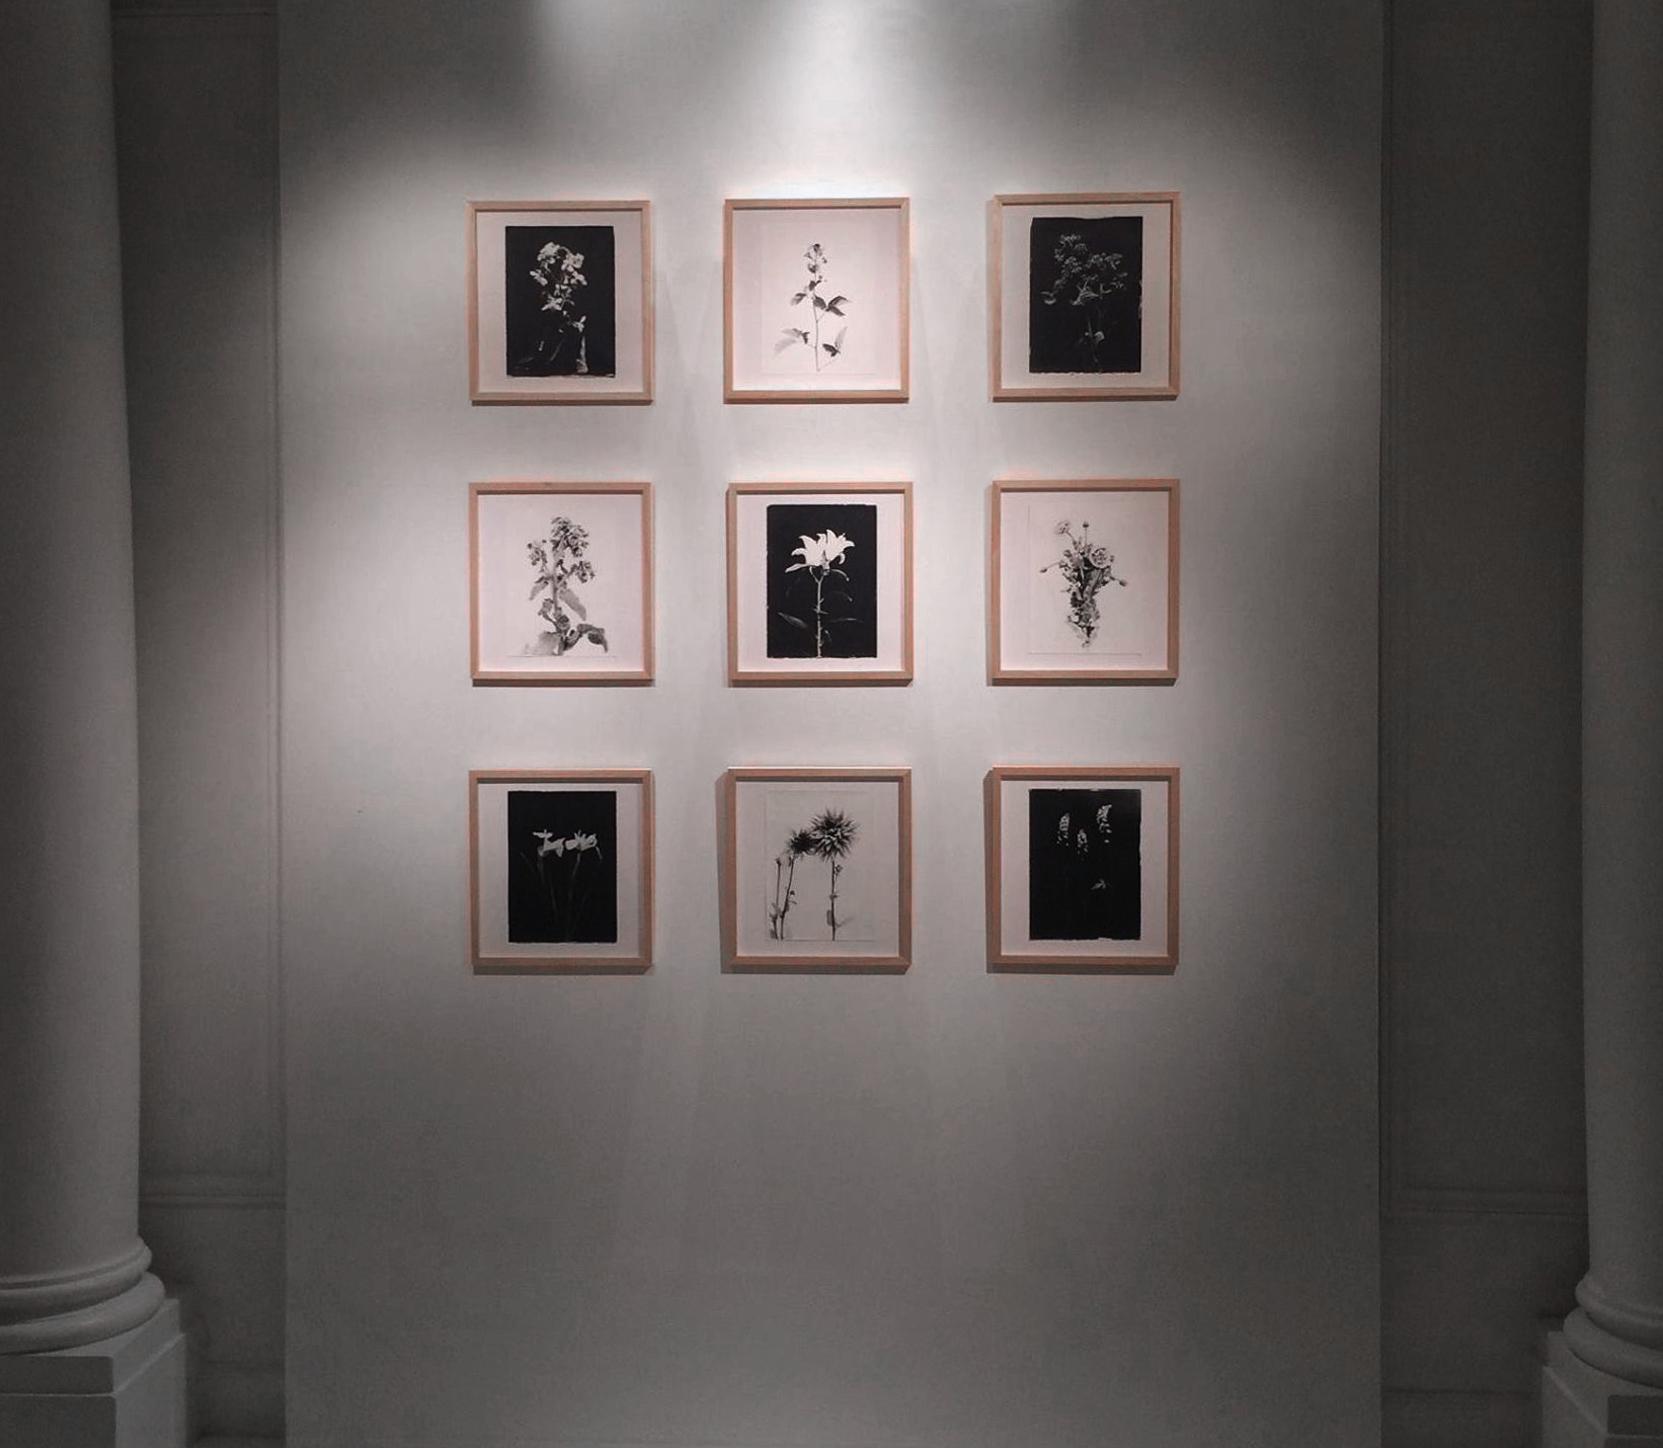 3-Exposition-Blandine-Chambost copy.jpg